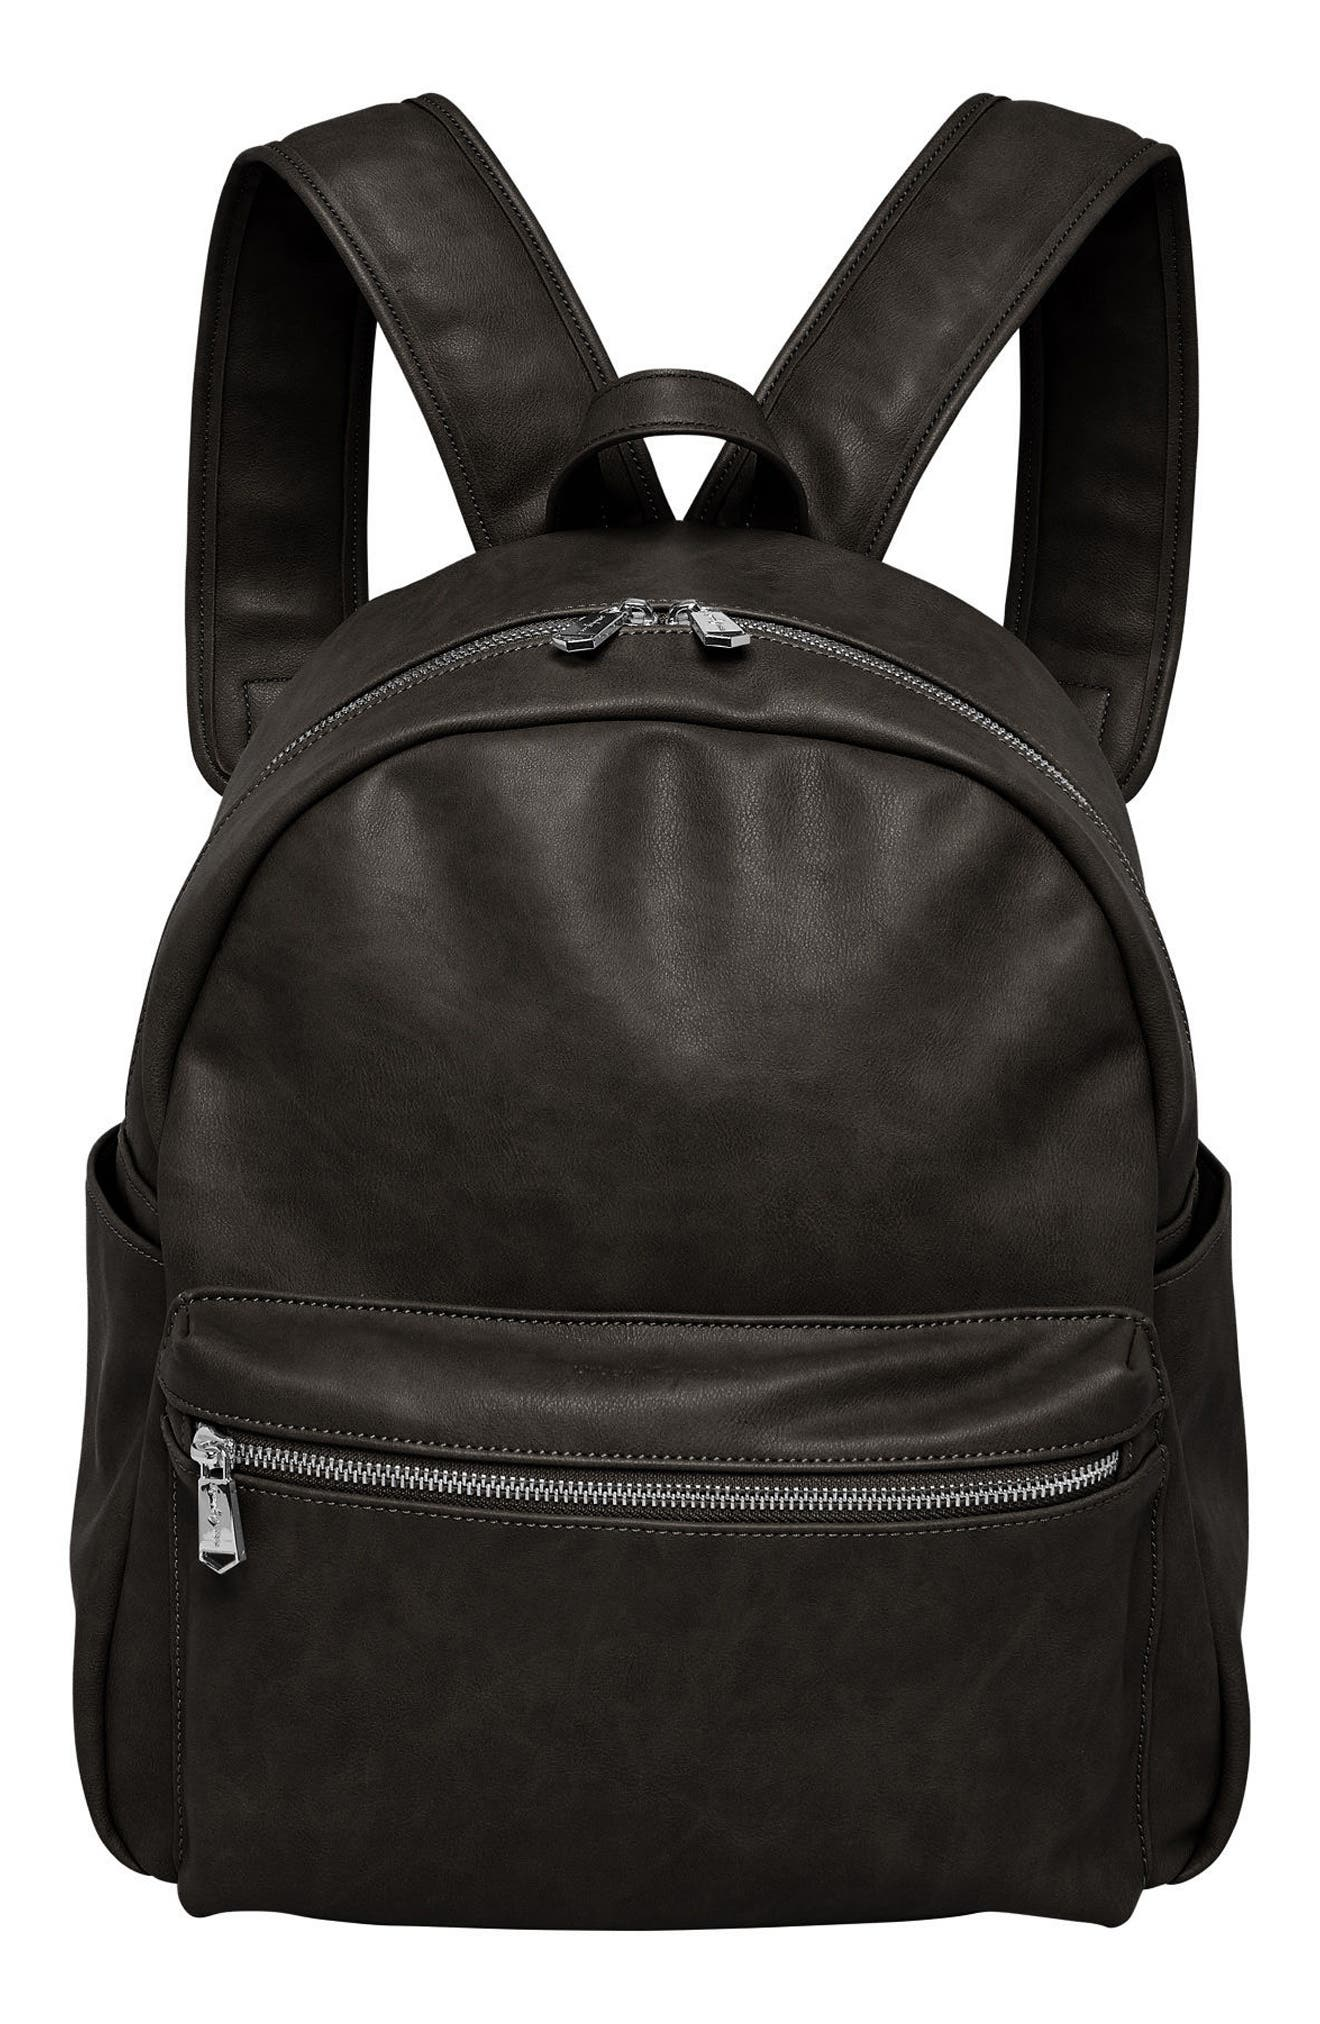 Practical Vegan Leather Backpack,                             Main thumbnail 1, color,                             001